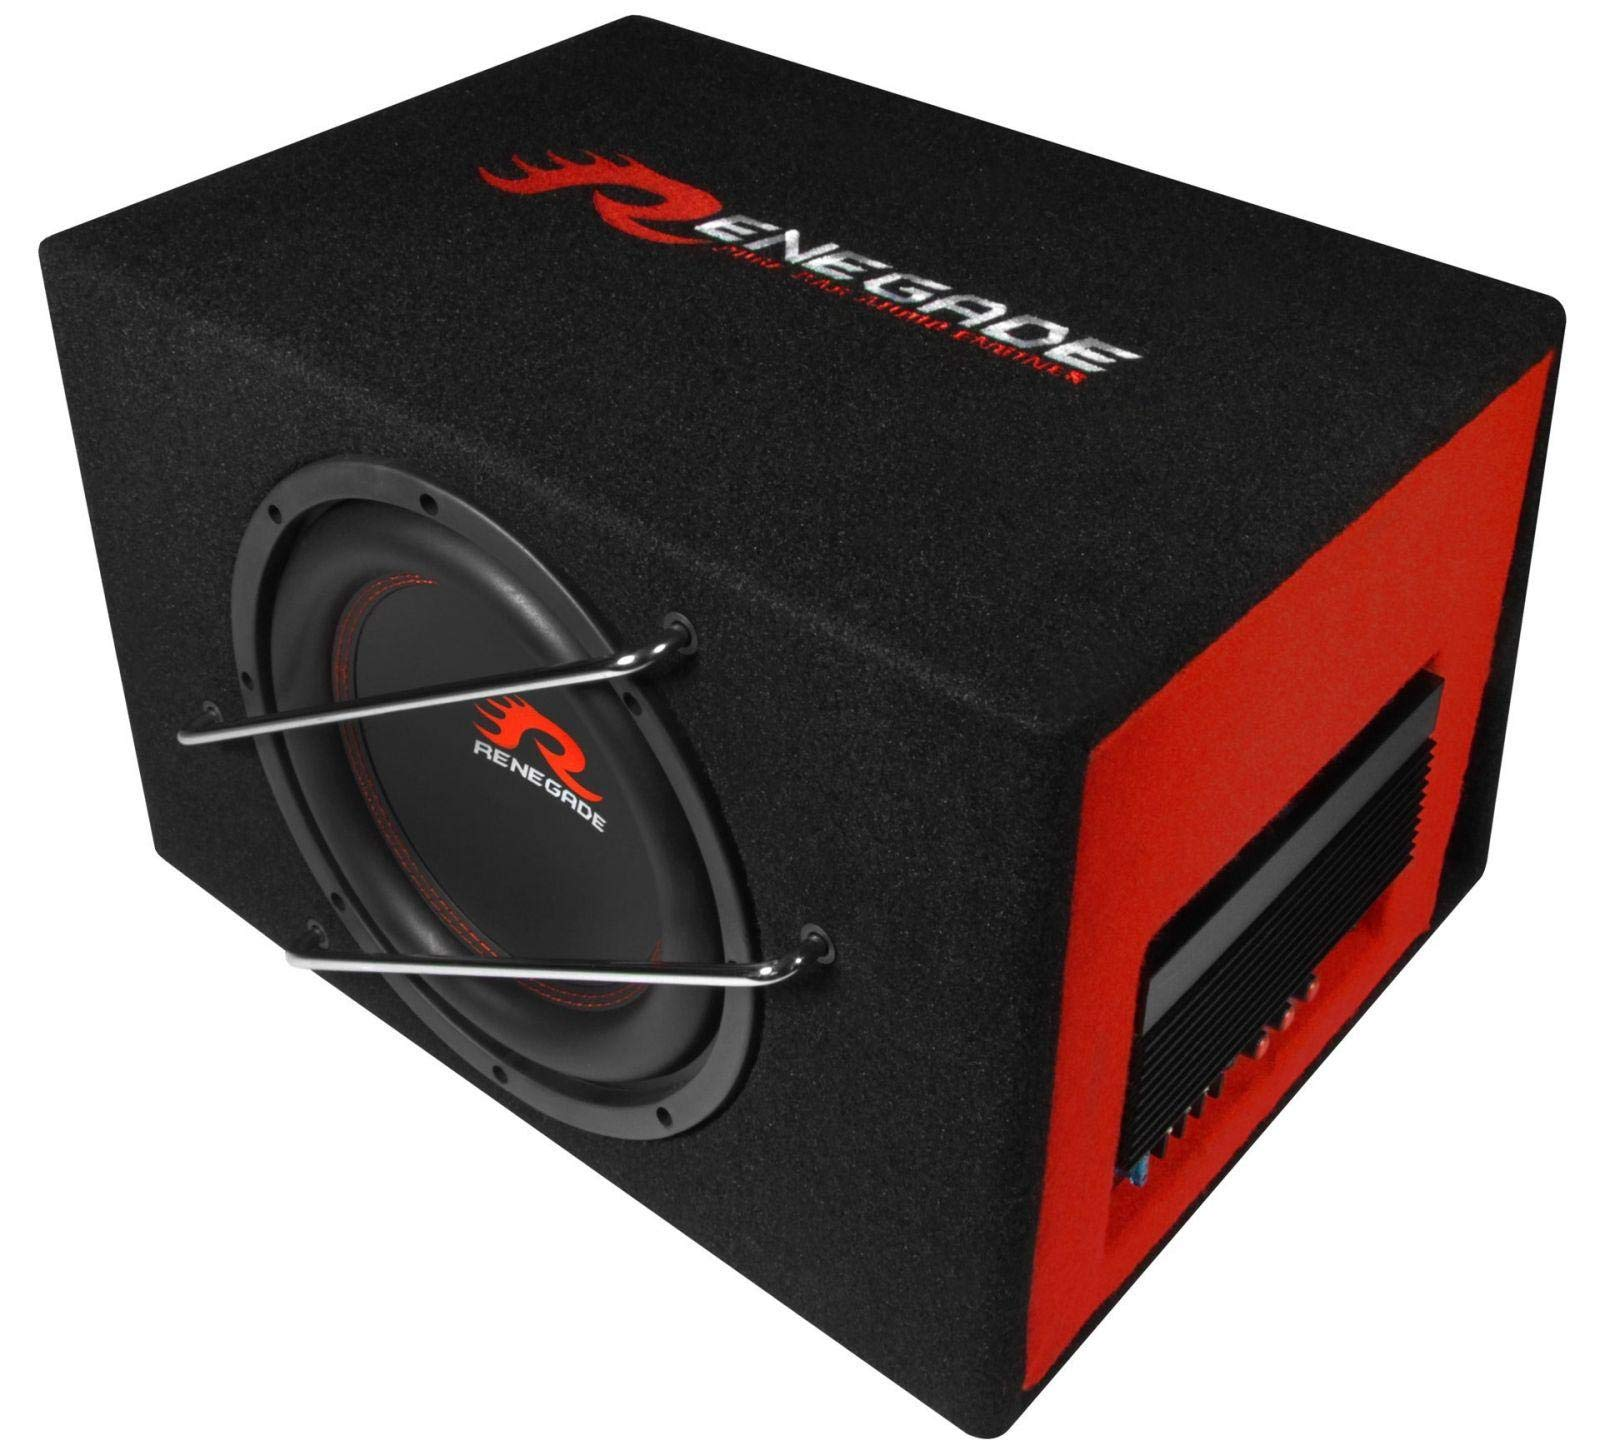 Audio Design RXV1000A subwoofers 200 W Altavoz de subgraves (subwoofer) activo Negro, Rojo: Amazon.es: Electrónica